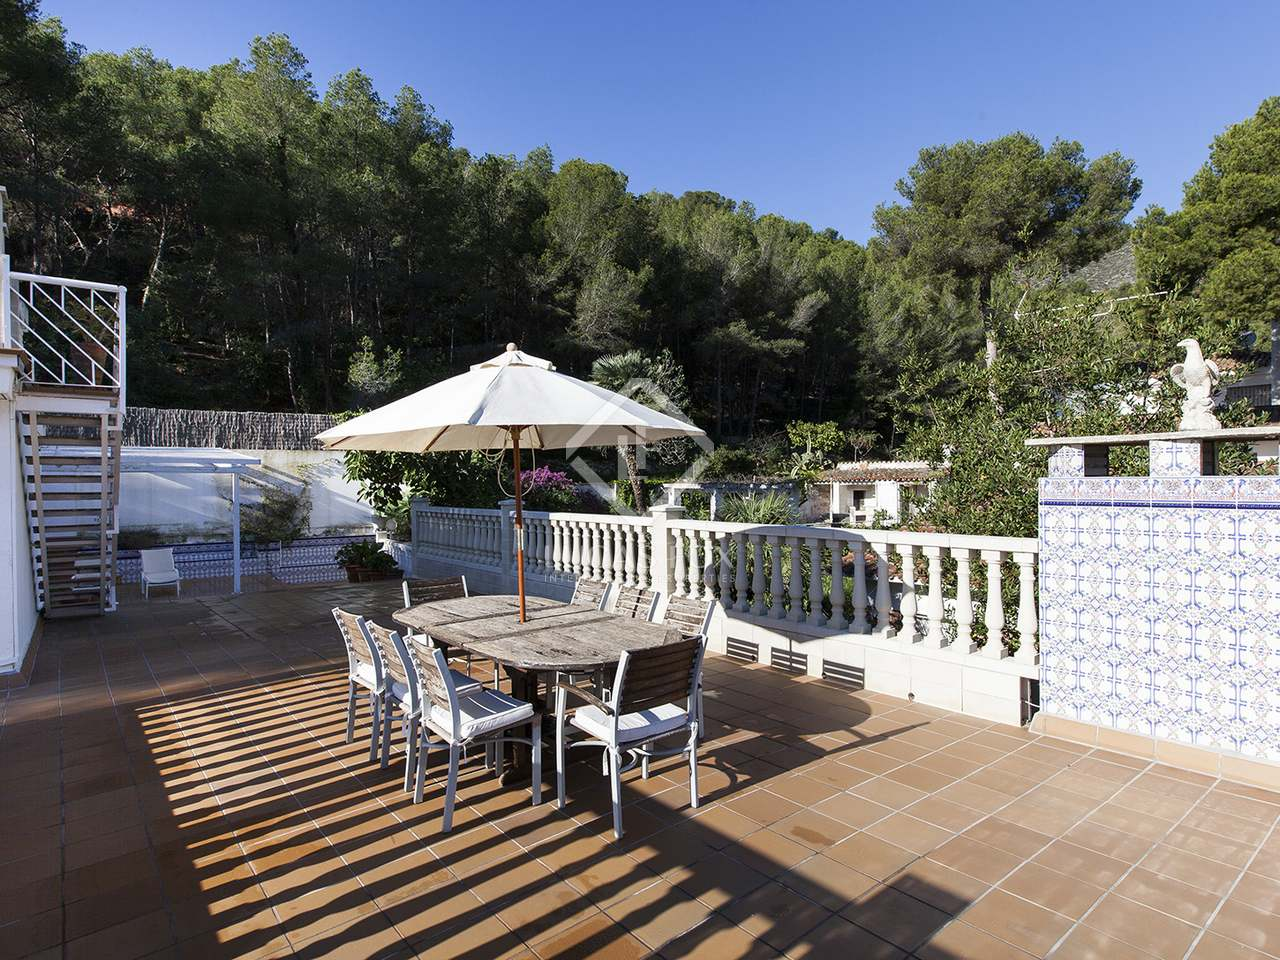 Villa de 5 dormitorios con piscina en venta en bellamar for Piscina castelldefels